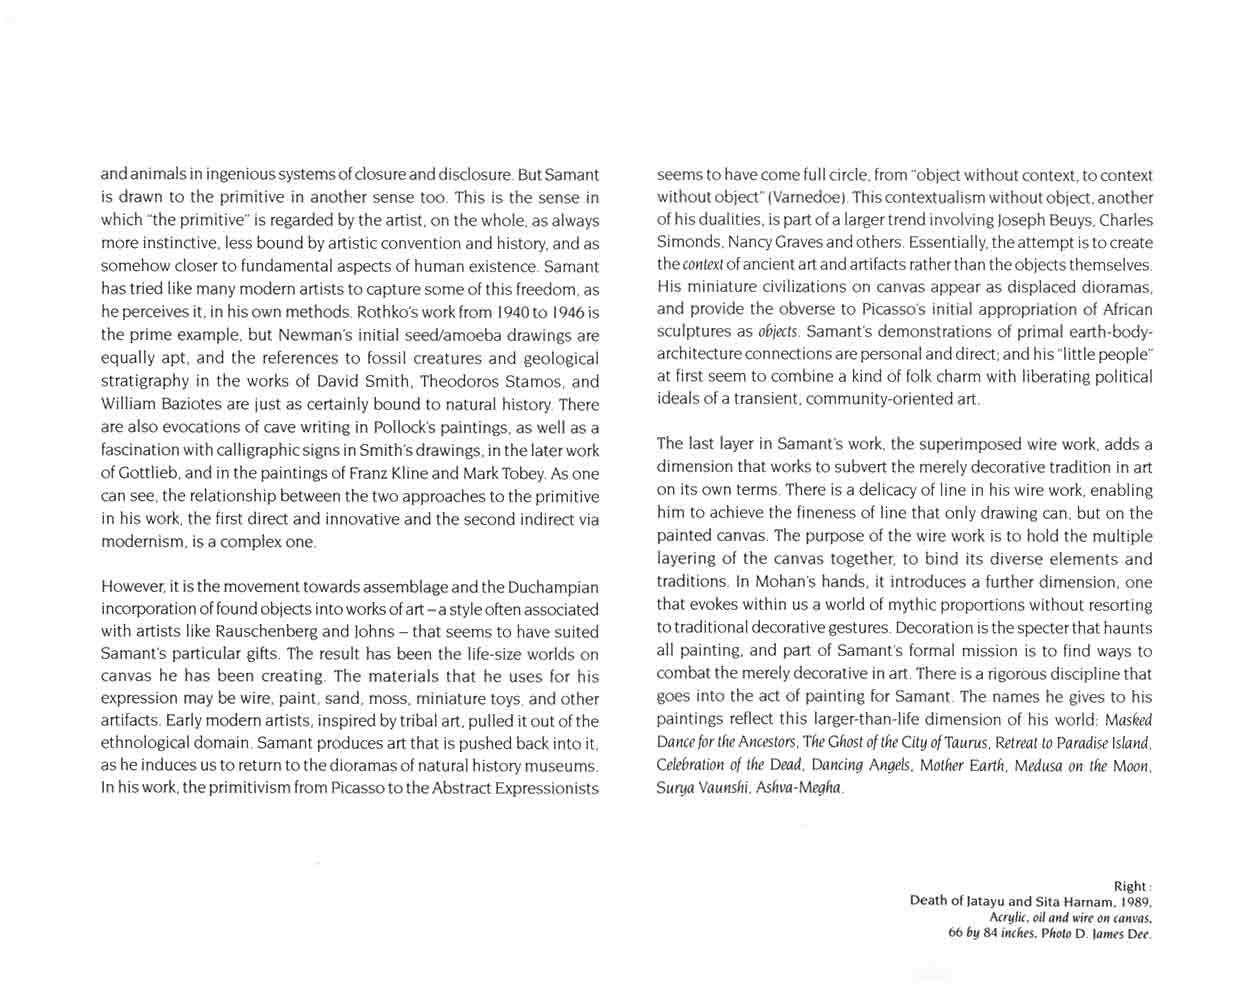 Mohan Samant, catalog, pg 2